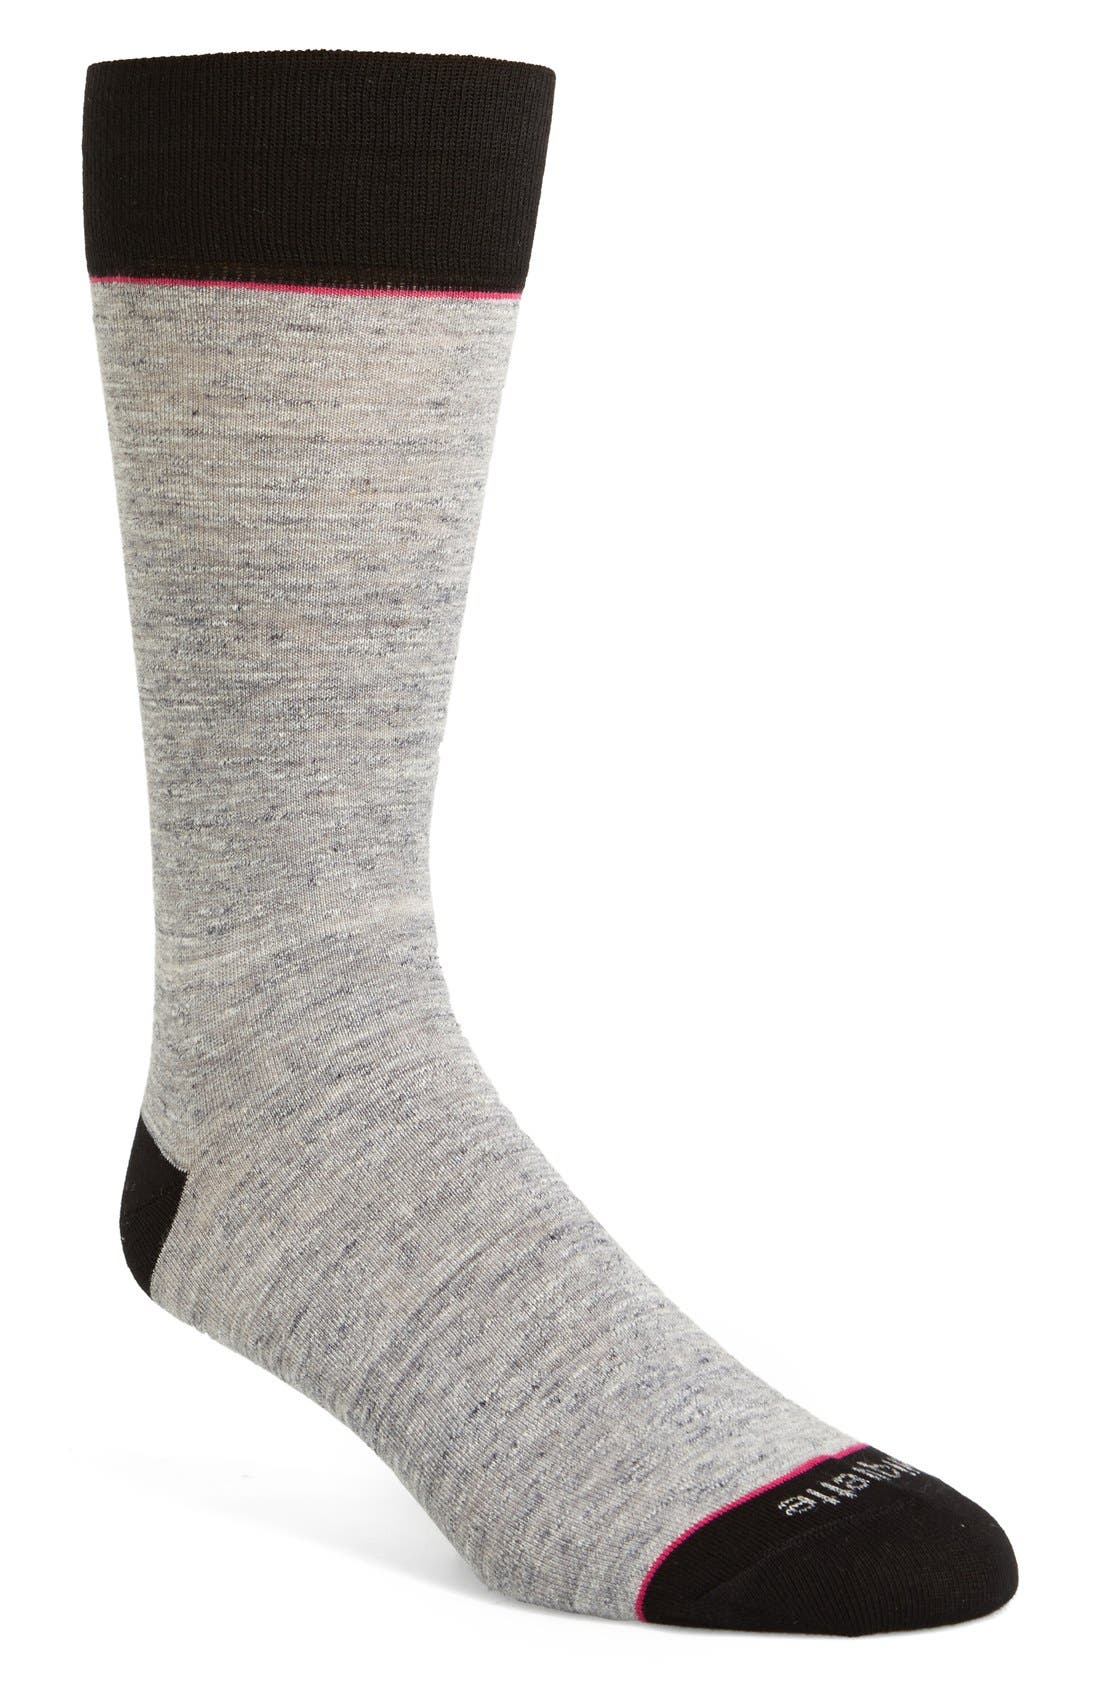 Alternate Image 1 Selected - Etiquette Clothiers Slubby Socks